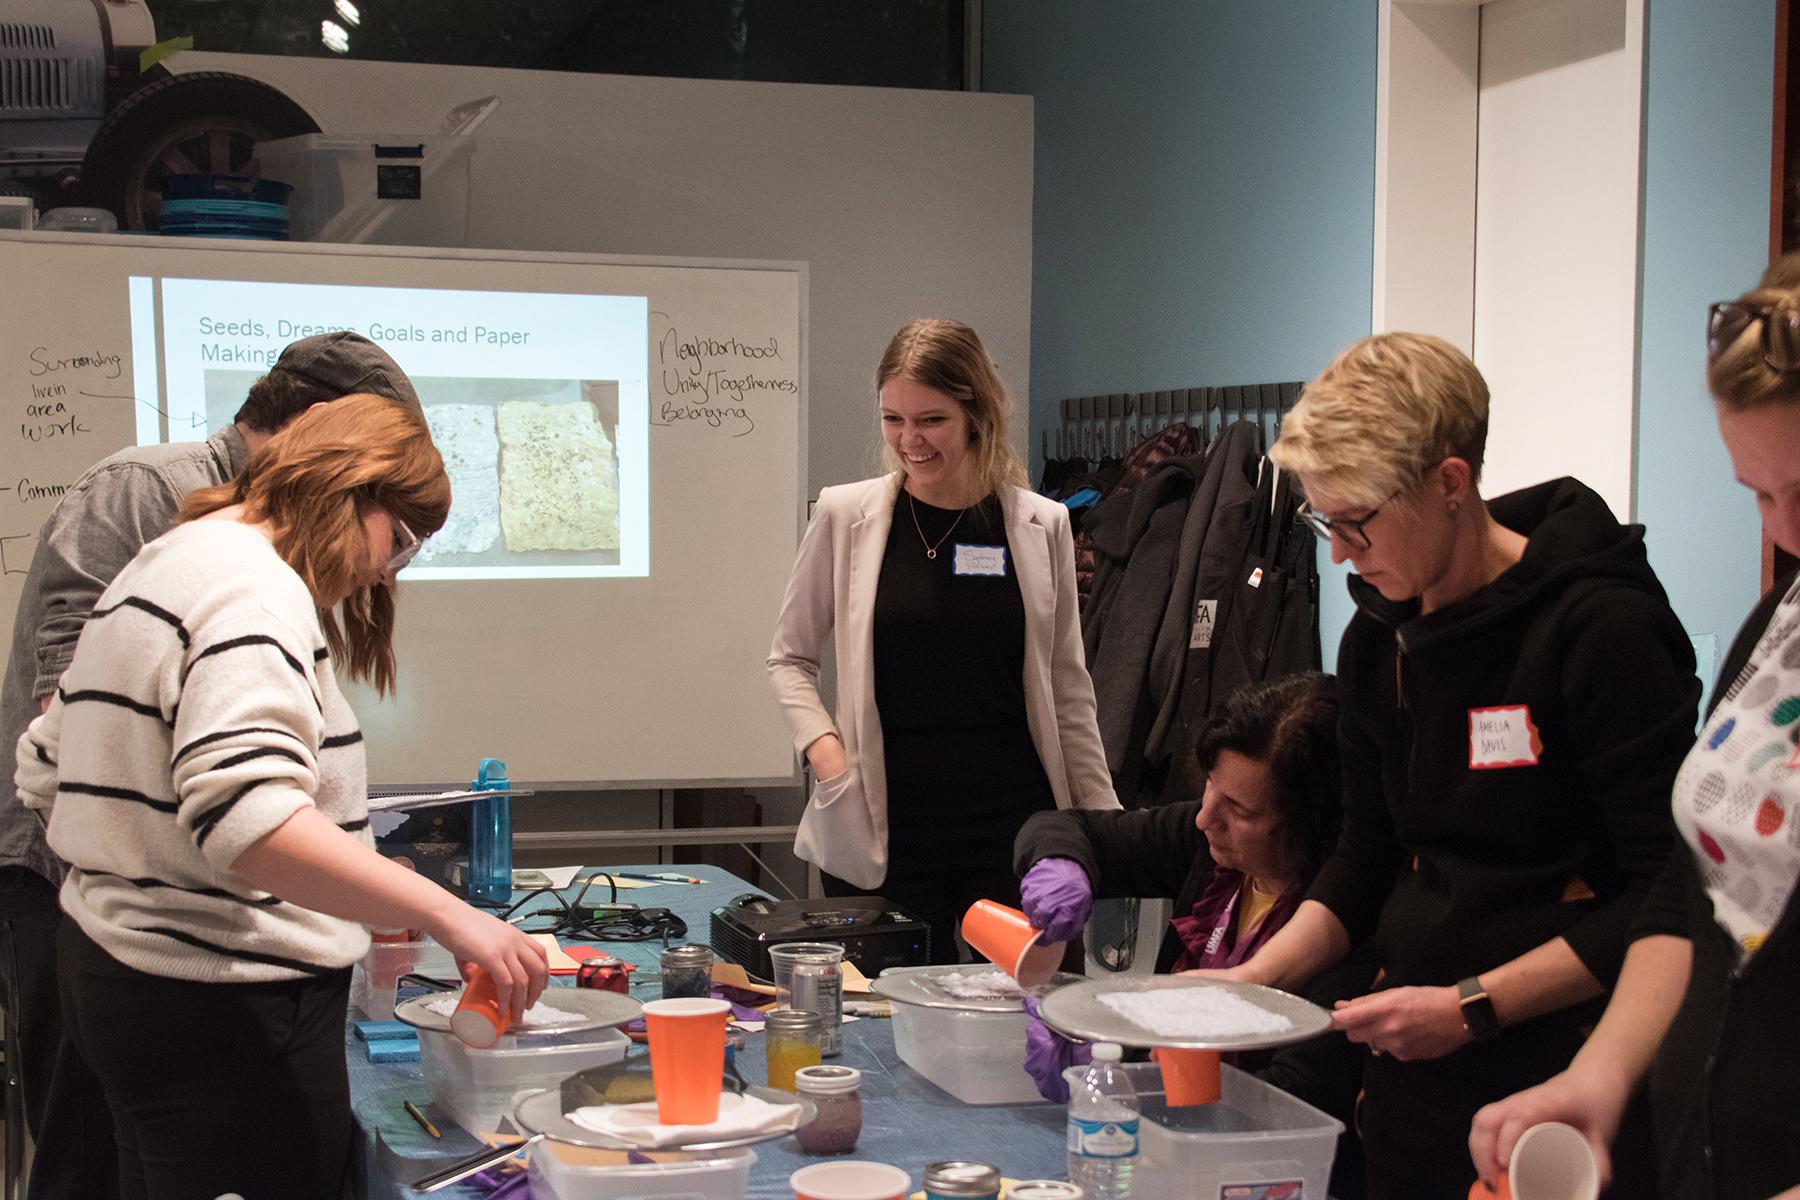 Seed Paper Making, UAEA Teacher's Night at the Utah Museum of Fine Arts, 2018